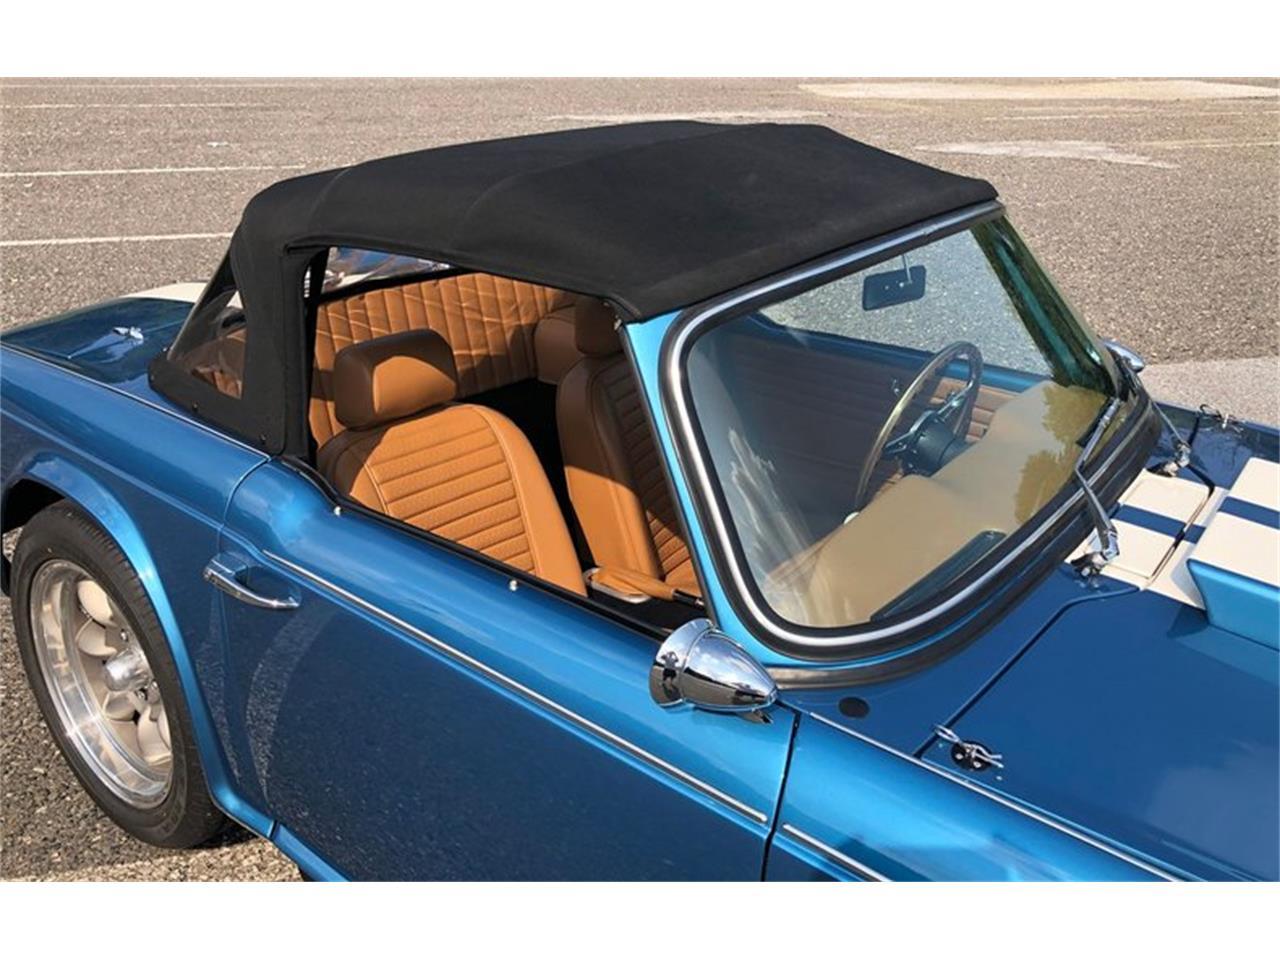 1966 Triumph TR4 (CC-1245613) for sale in West Chester, Pennsylvania